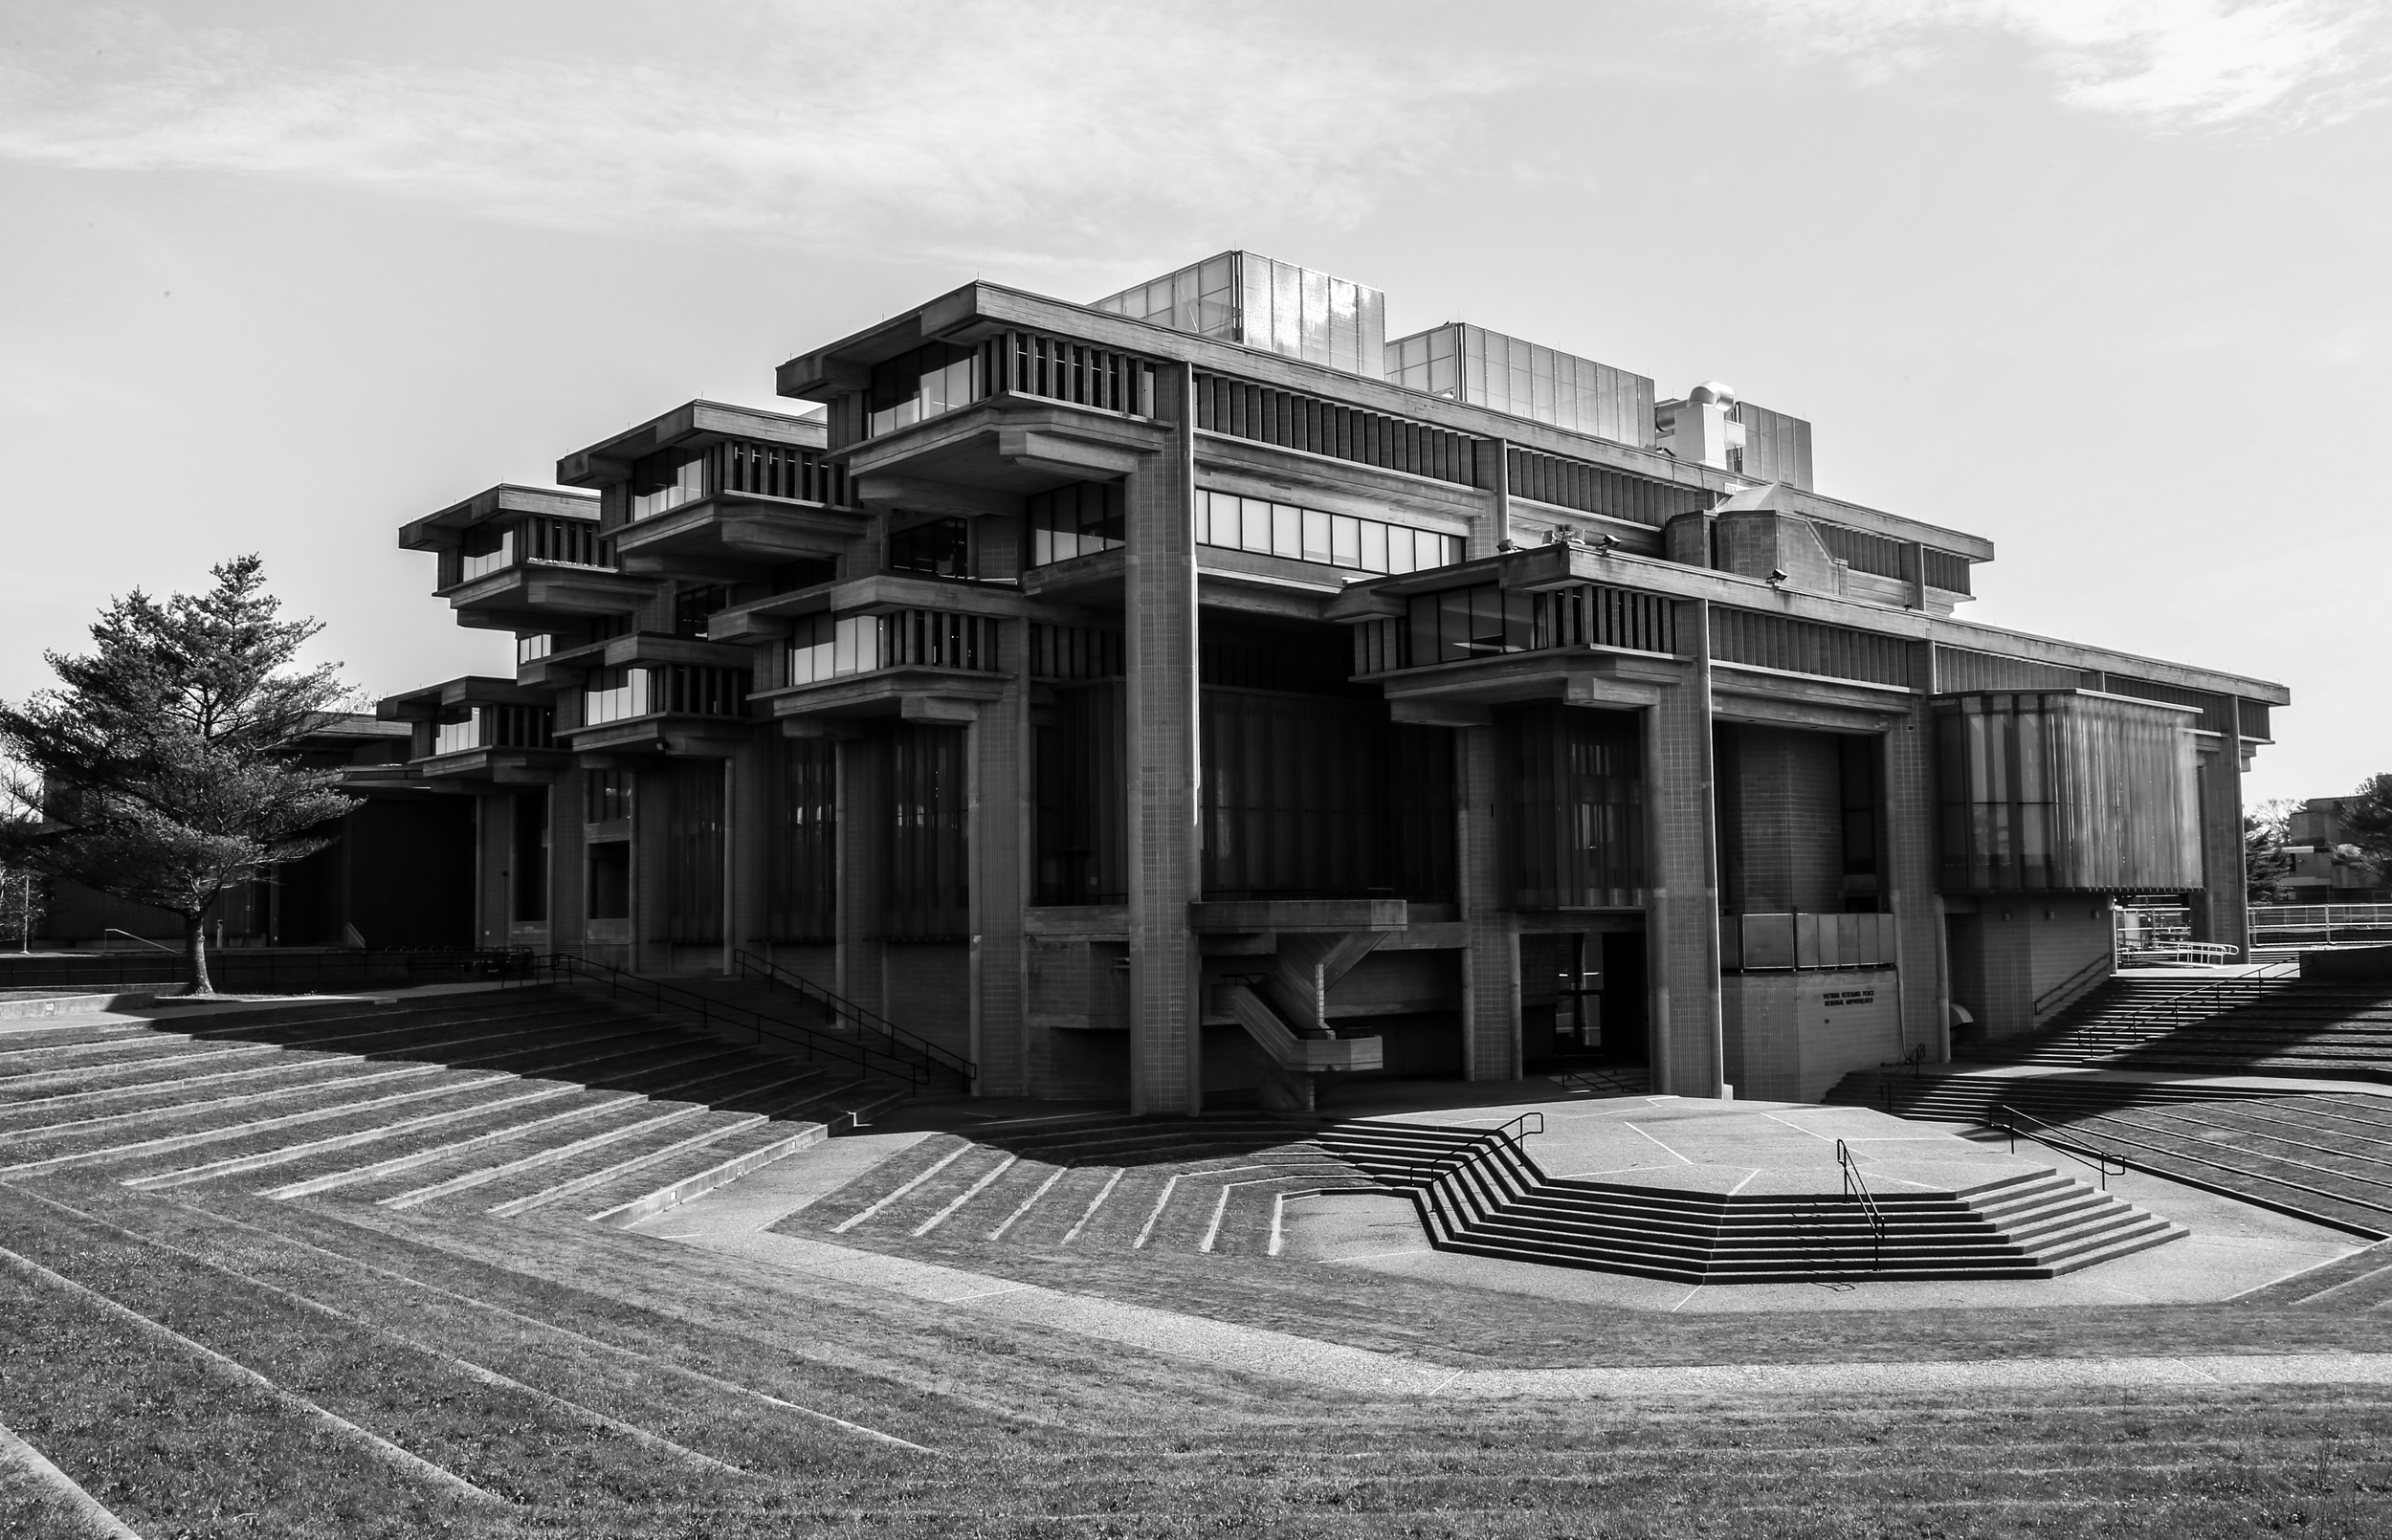 Vietnam Veterans Peace Memorial Amphitheater at University of Massachusetts Dartmouth - North Dartmouth, Massachusetts - Paul Rudolph